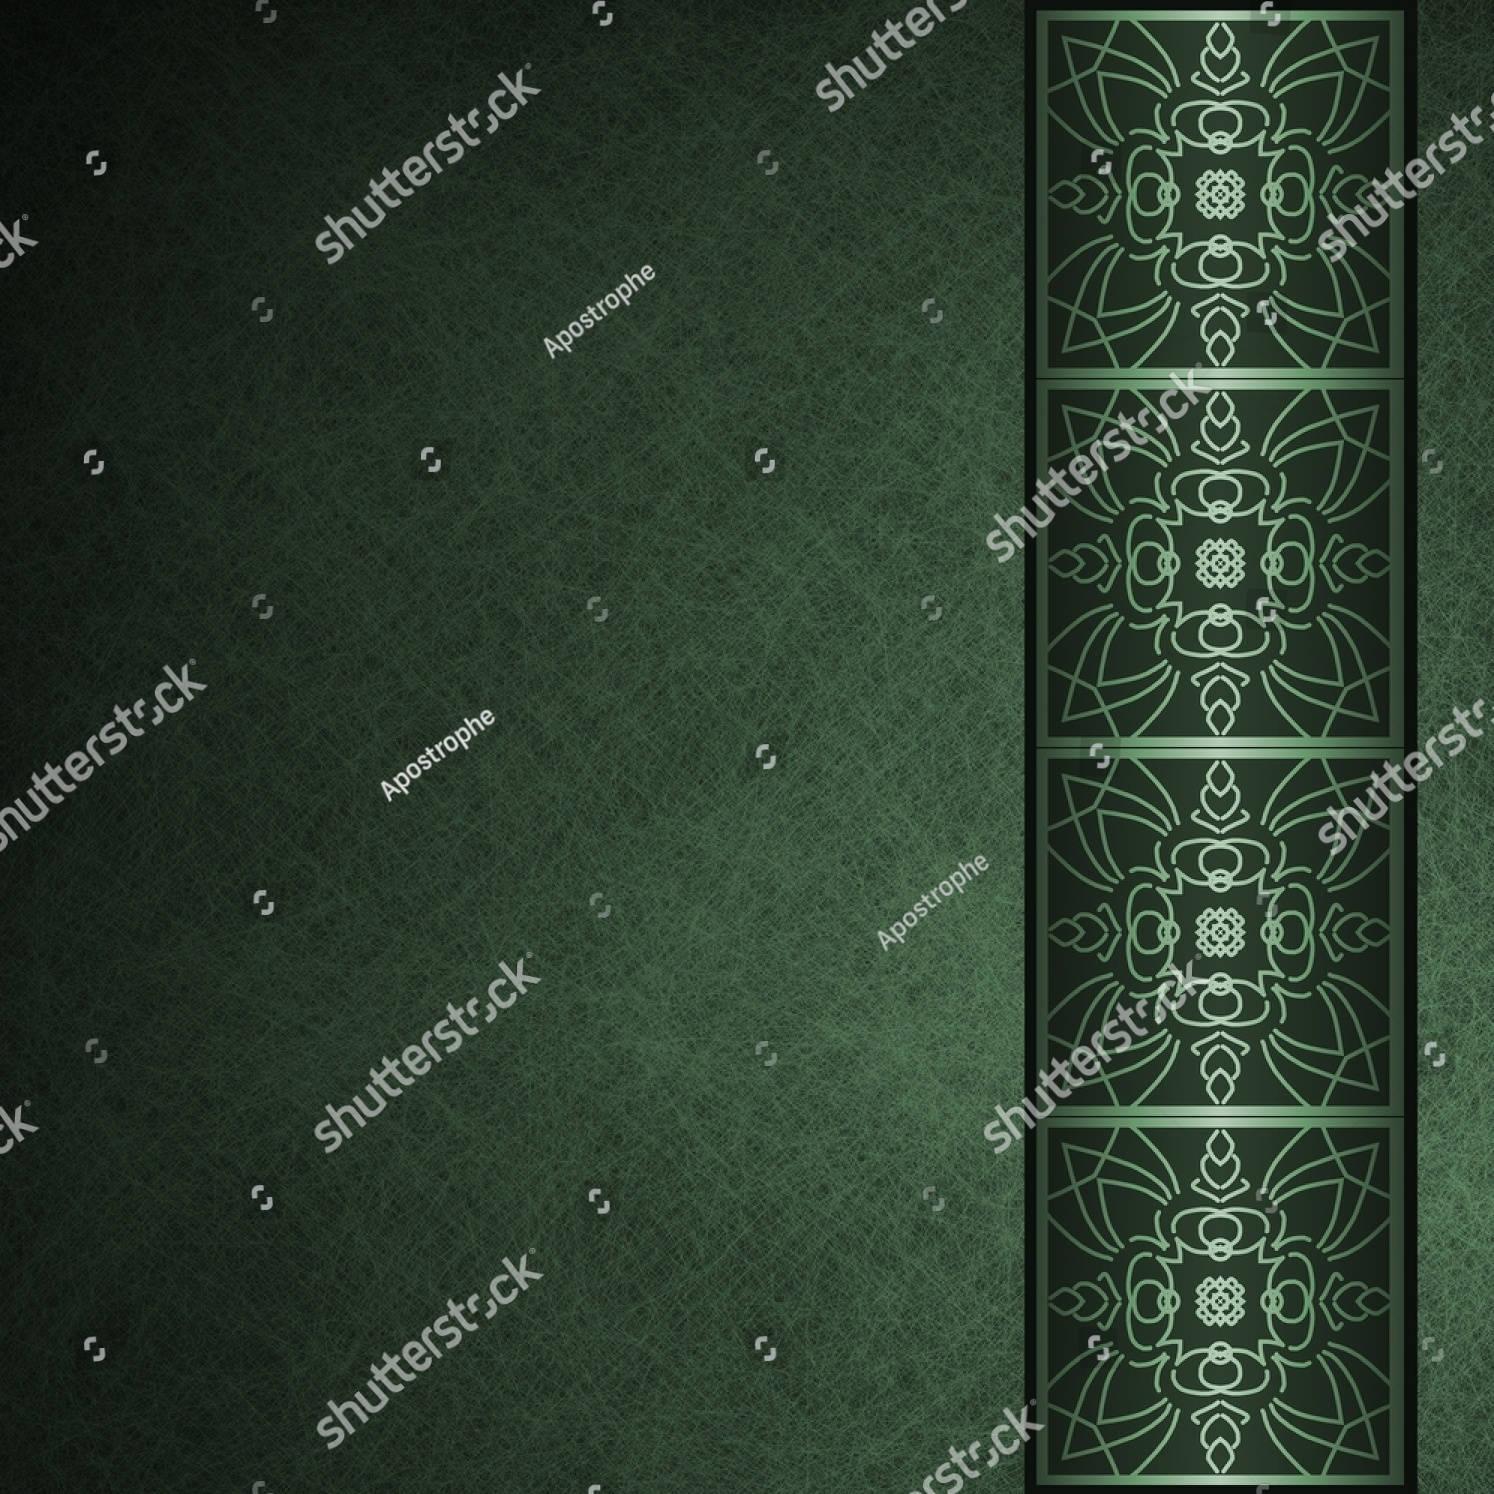 dark green background formal invitation